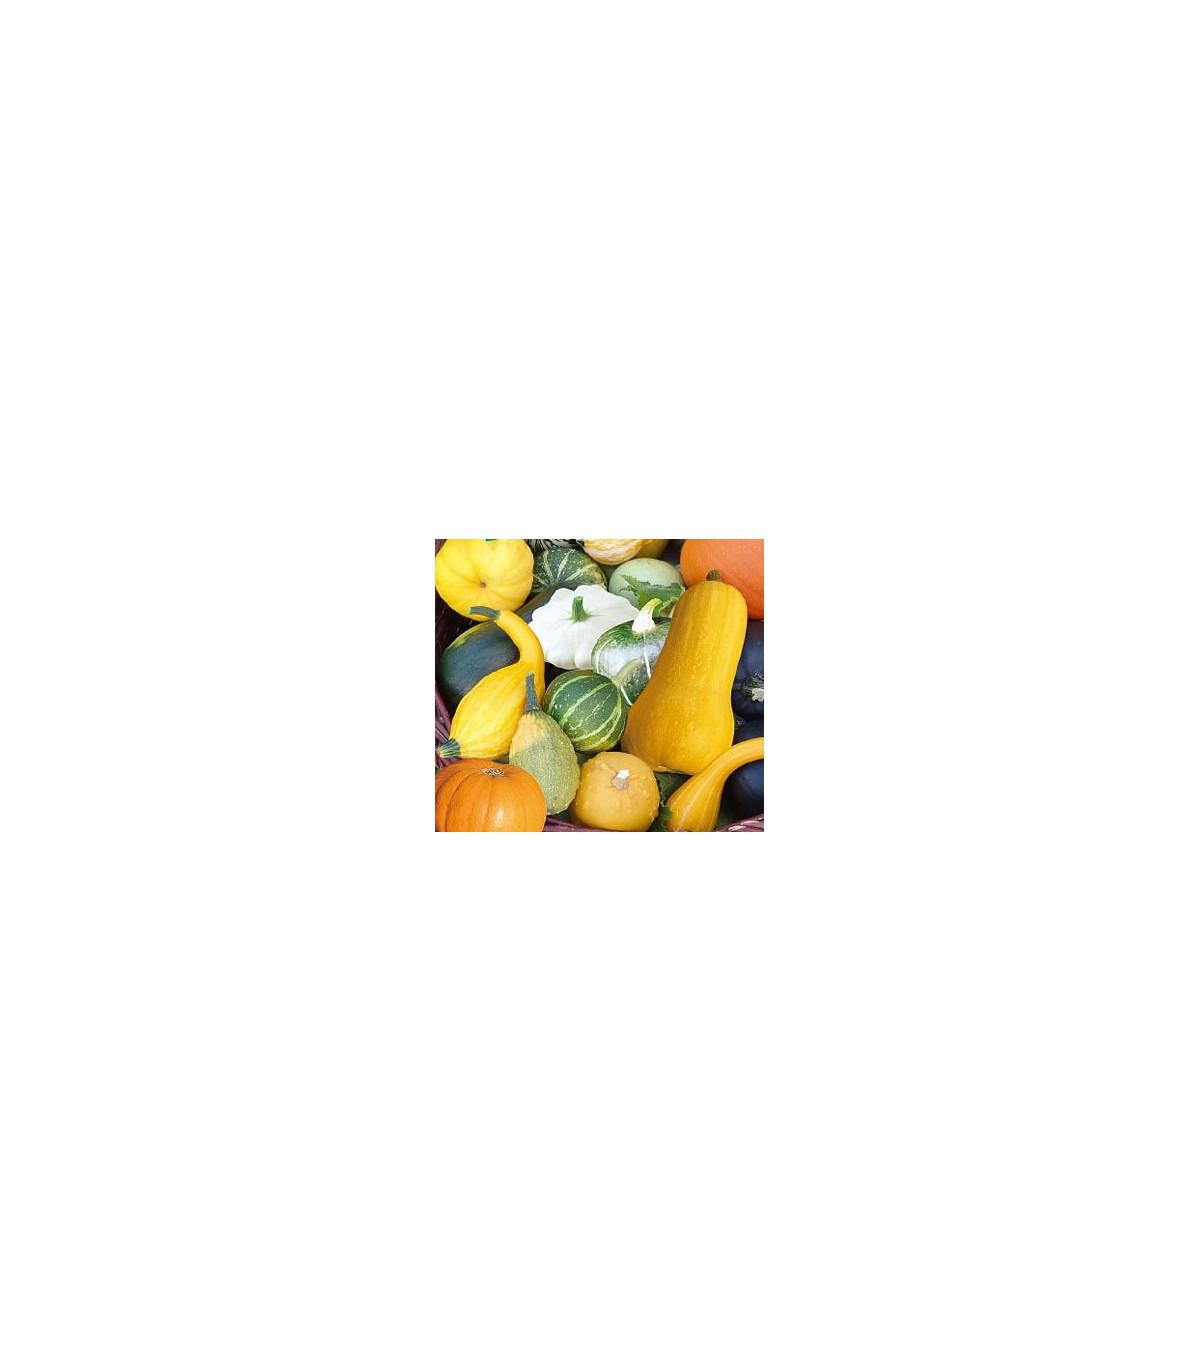 Tykev velkoplodá Gourmet - rostlina Cucurbita maxima - prodej semen tykve - 4 ks